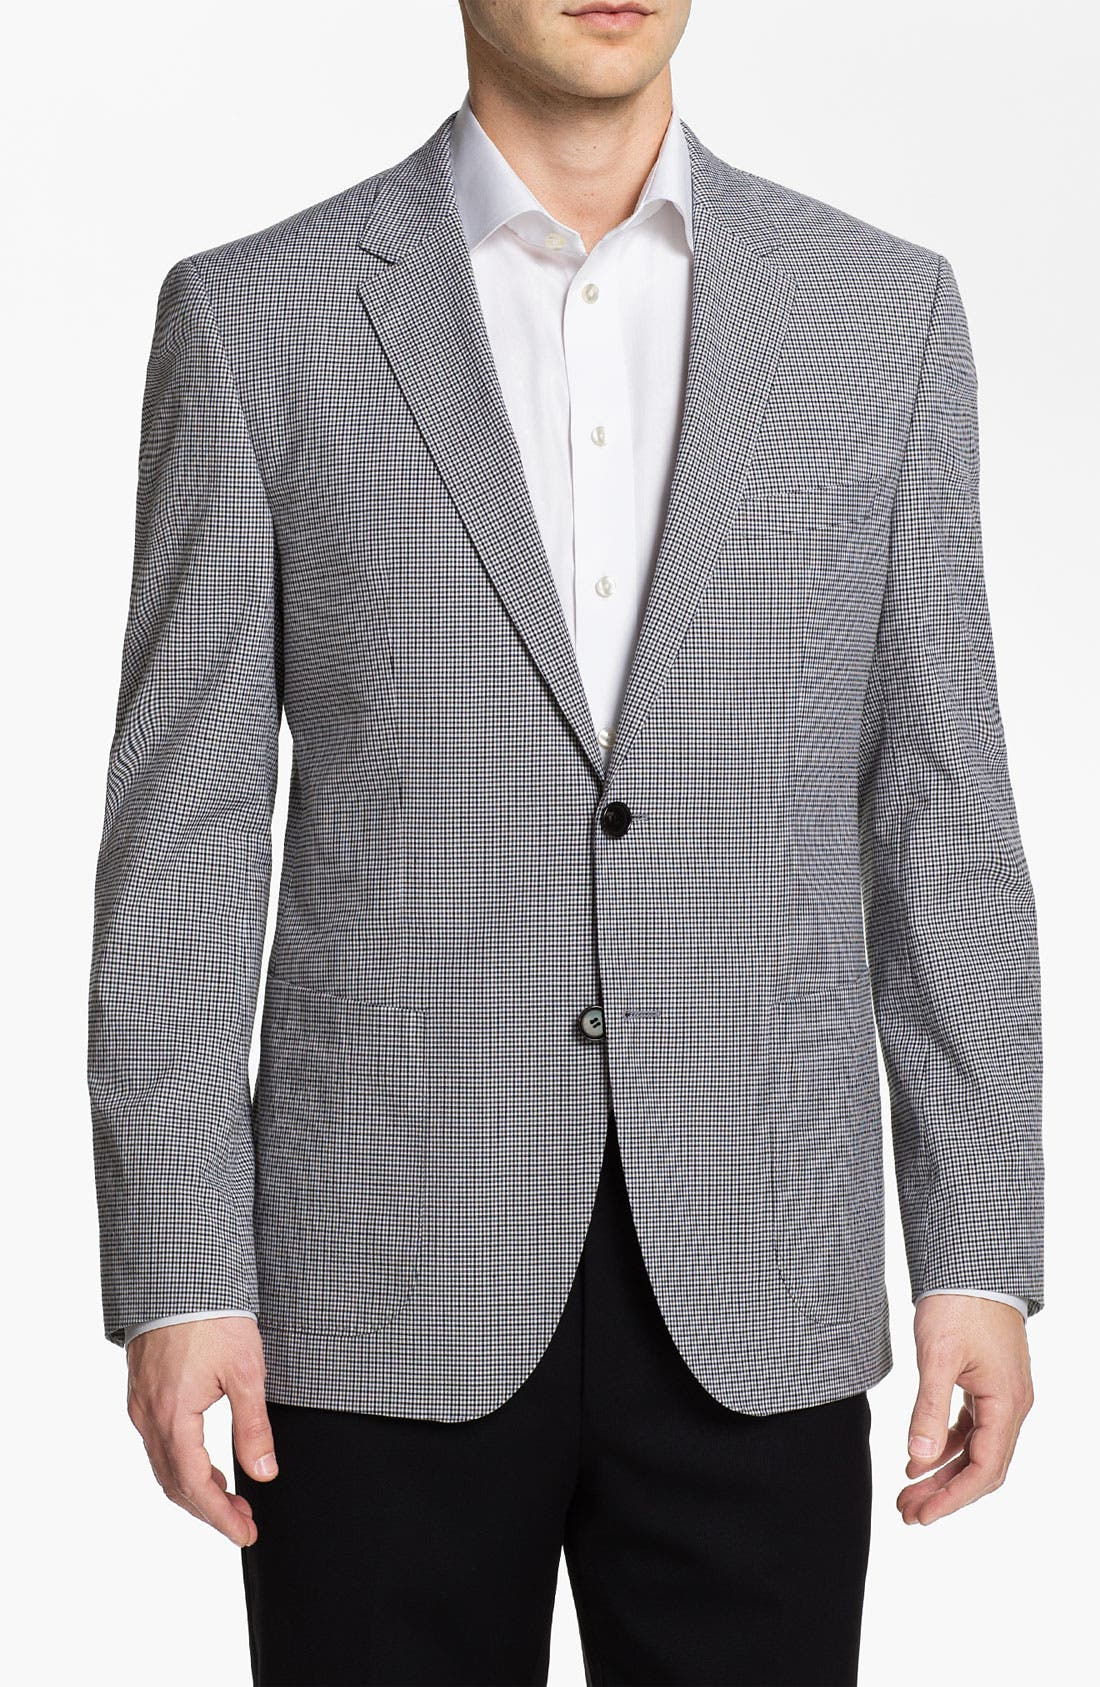 Alternate Image 1 Selected - BOSS HUGO BOSS 'Jesse' Trim Fit Sportcoat